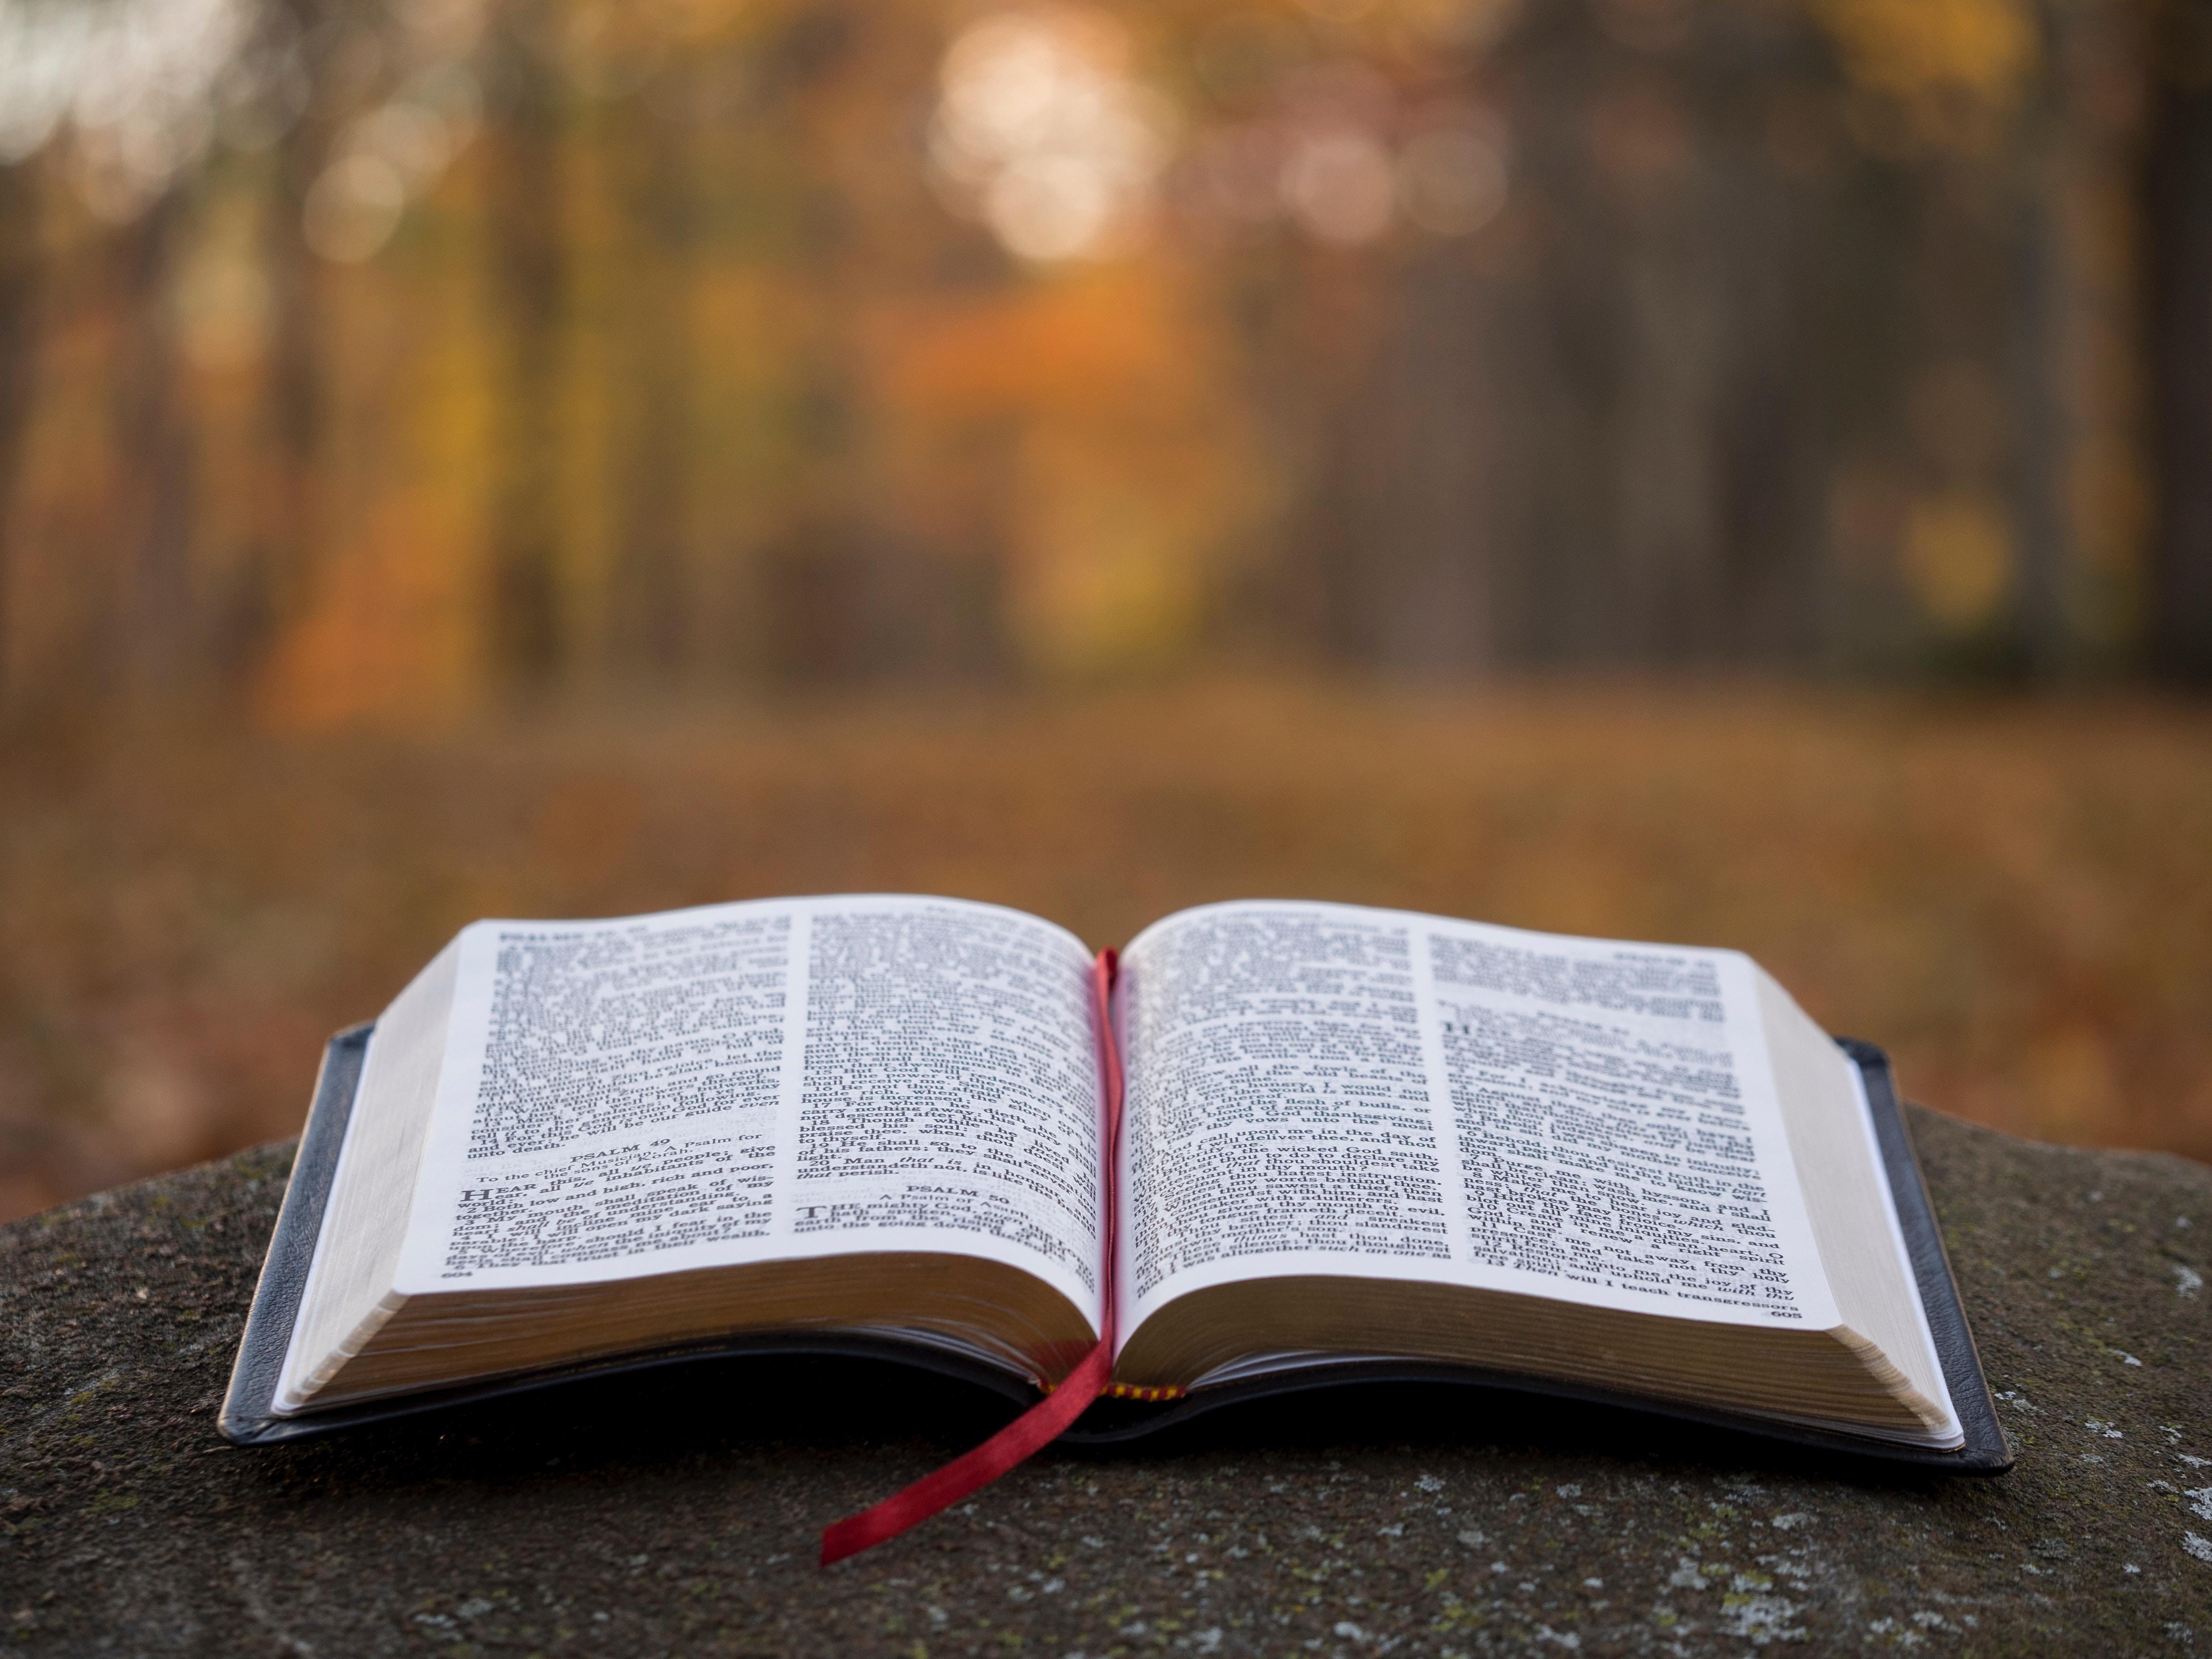 Otwarta Biblia na kamieniu